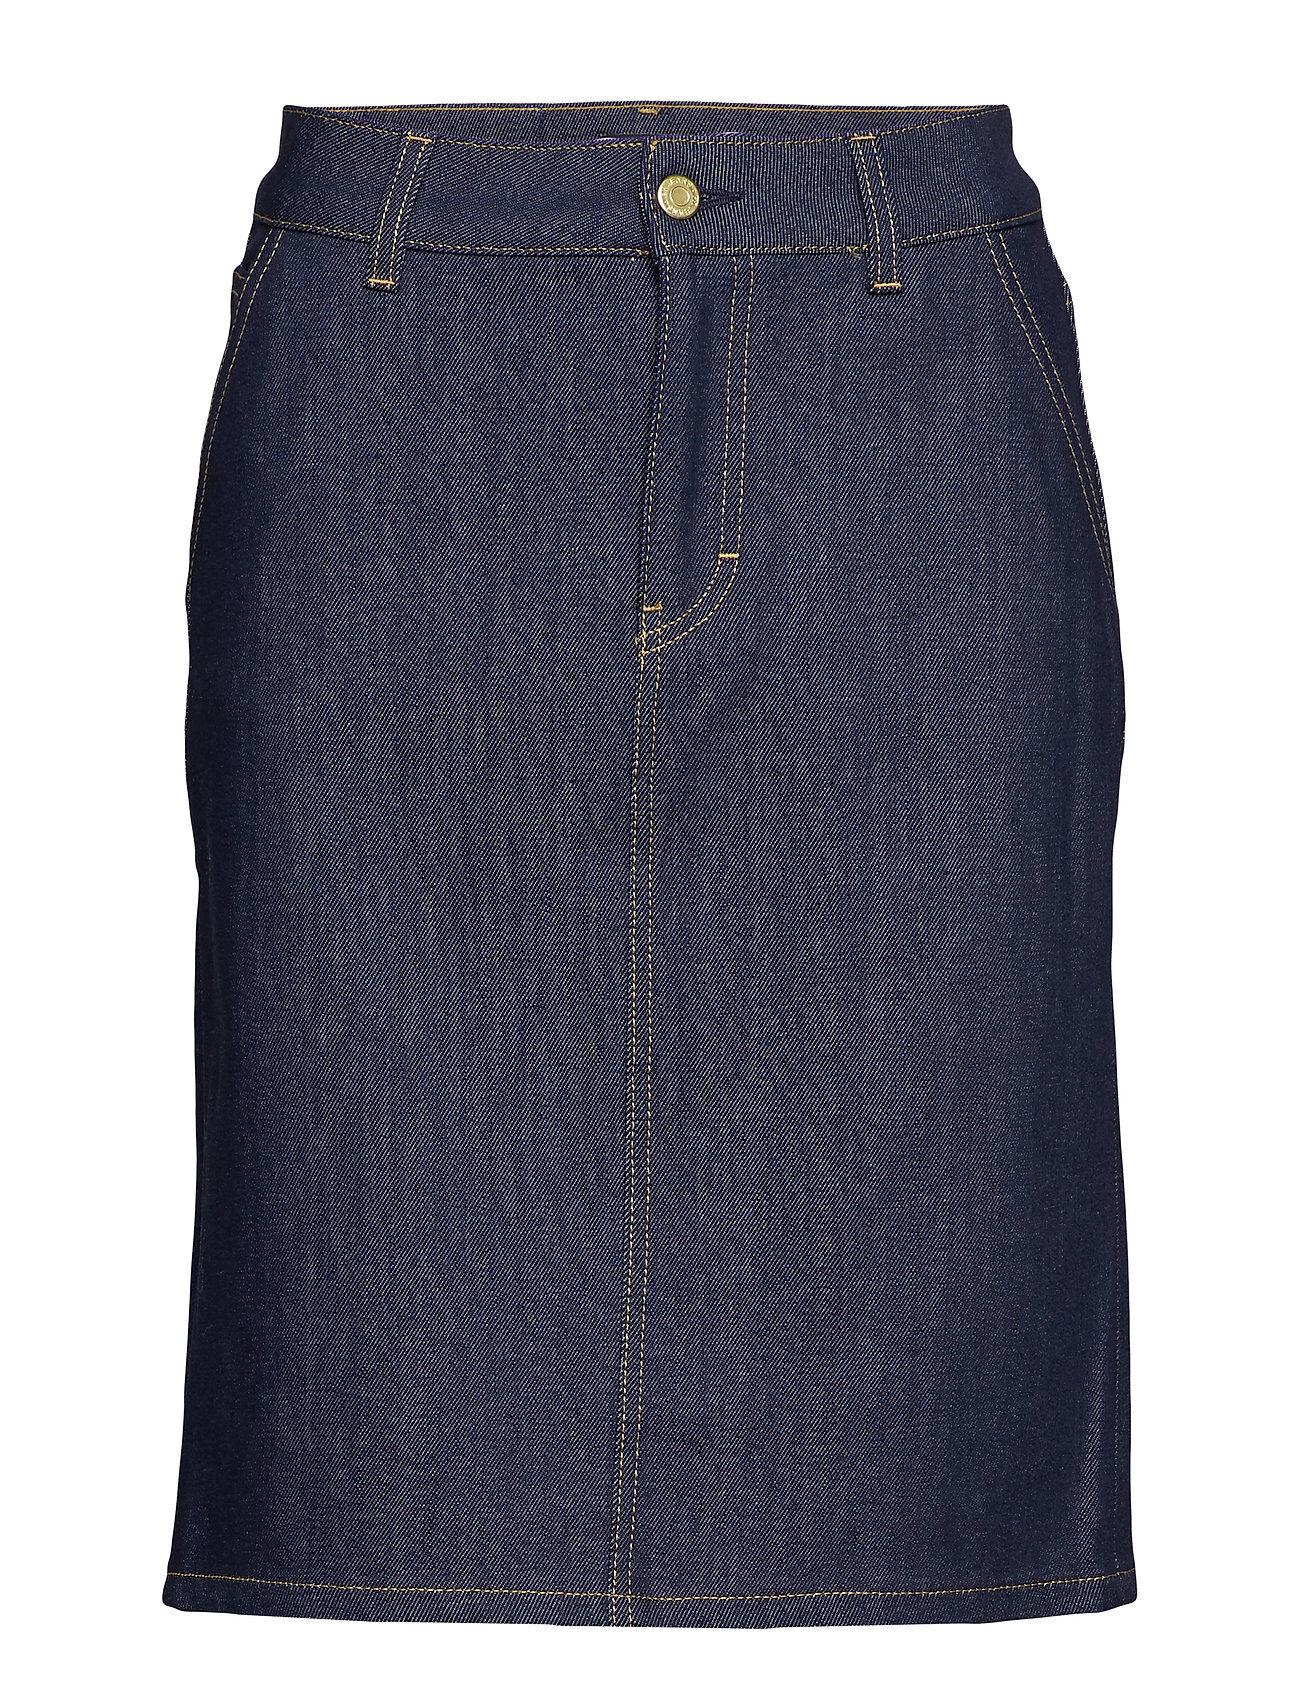 Filippa K Alicia Raw Denim Skirt